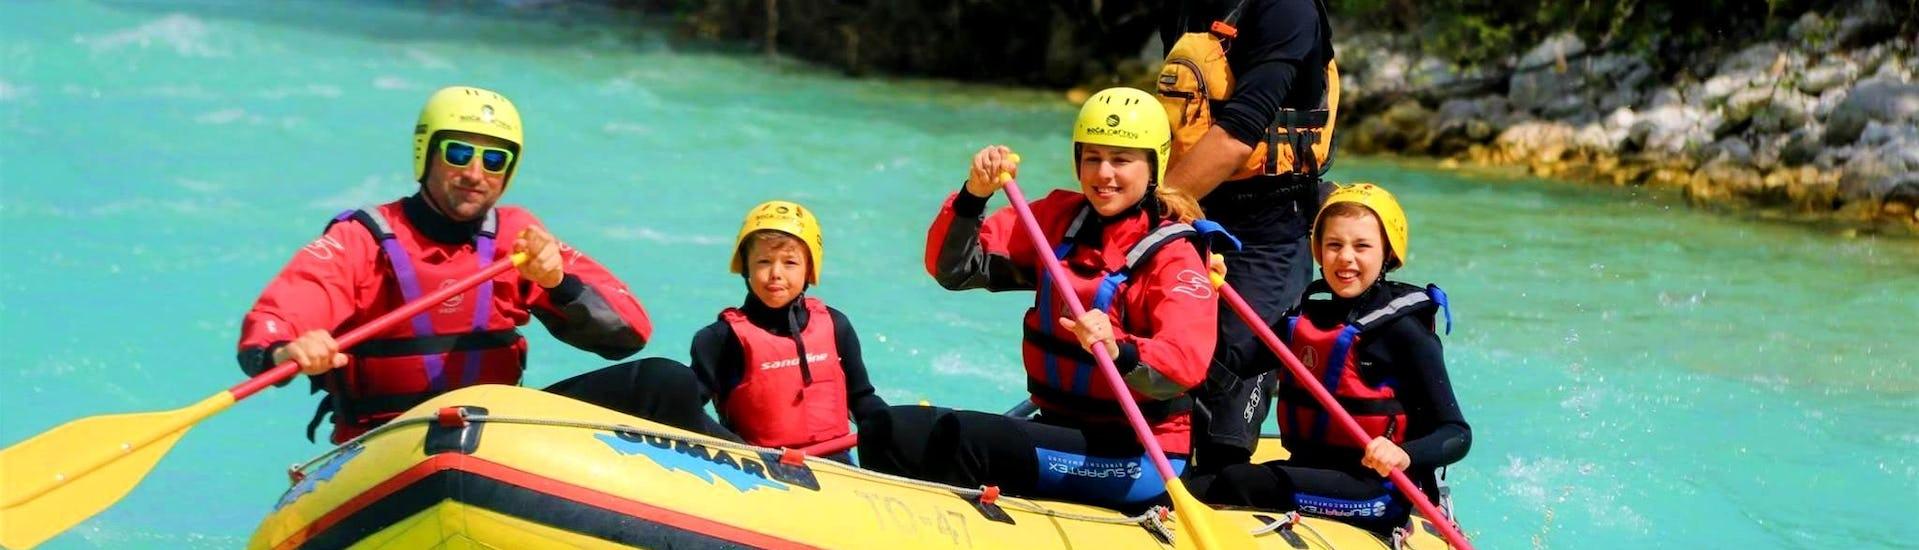 Rafting on the Soča for Families - Kreda